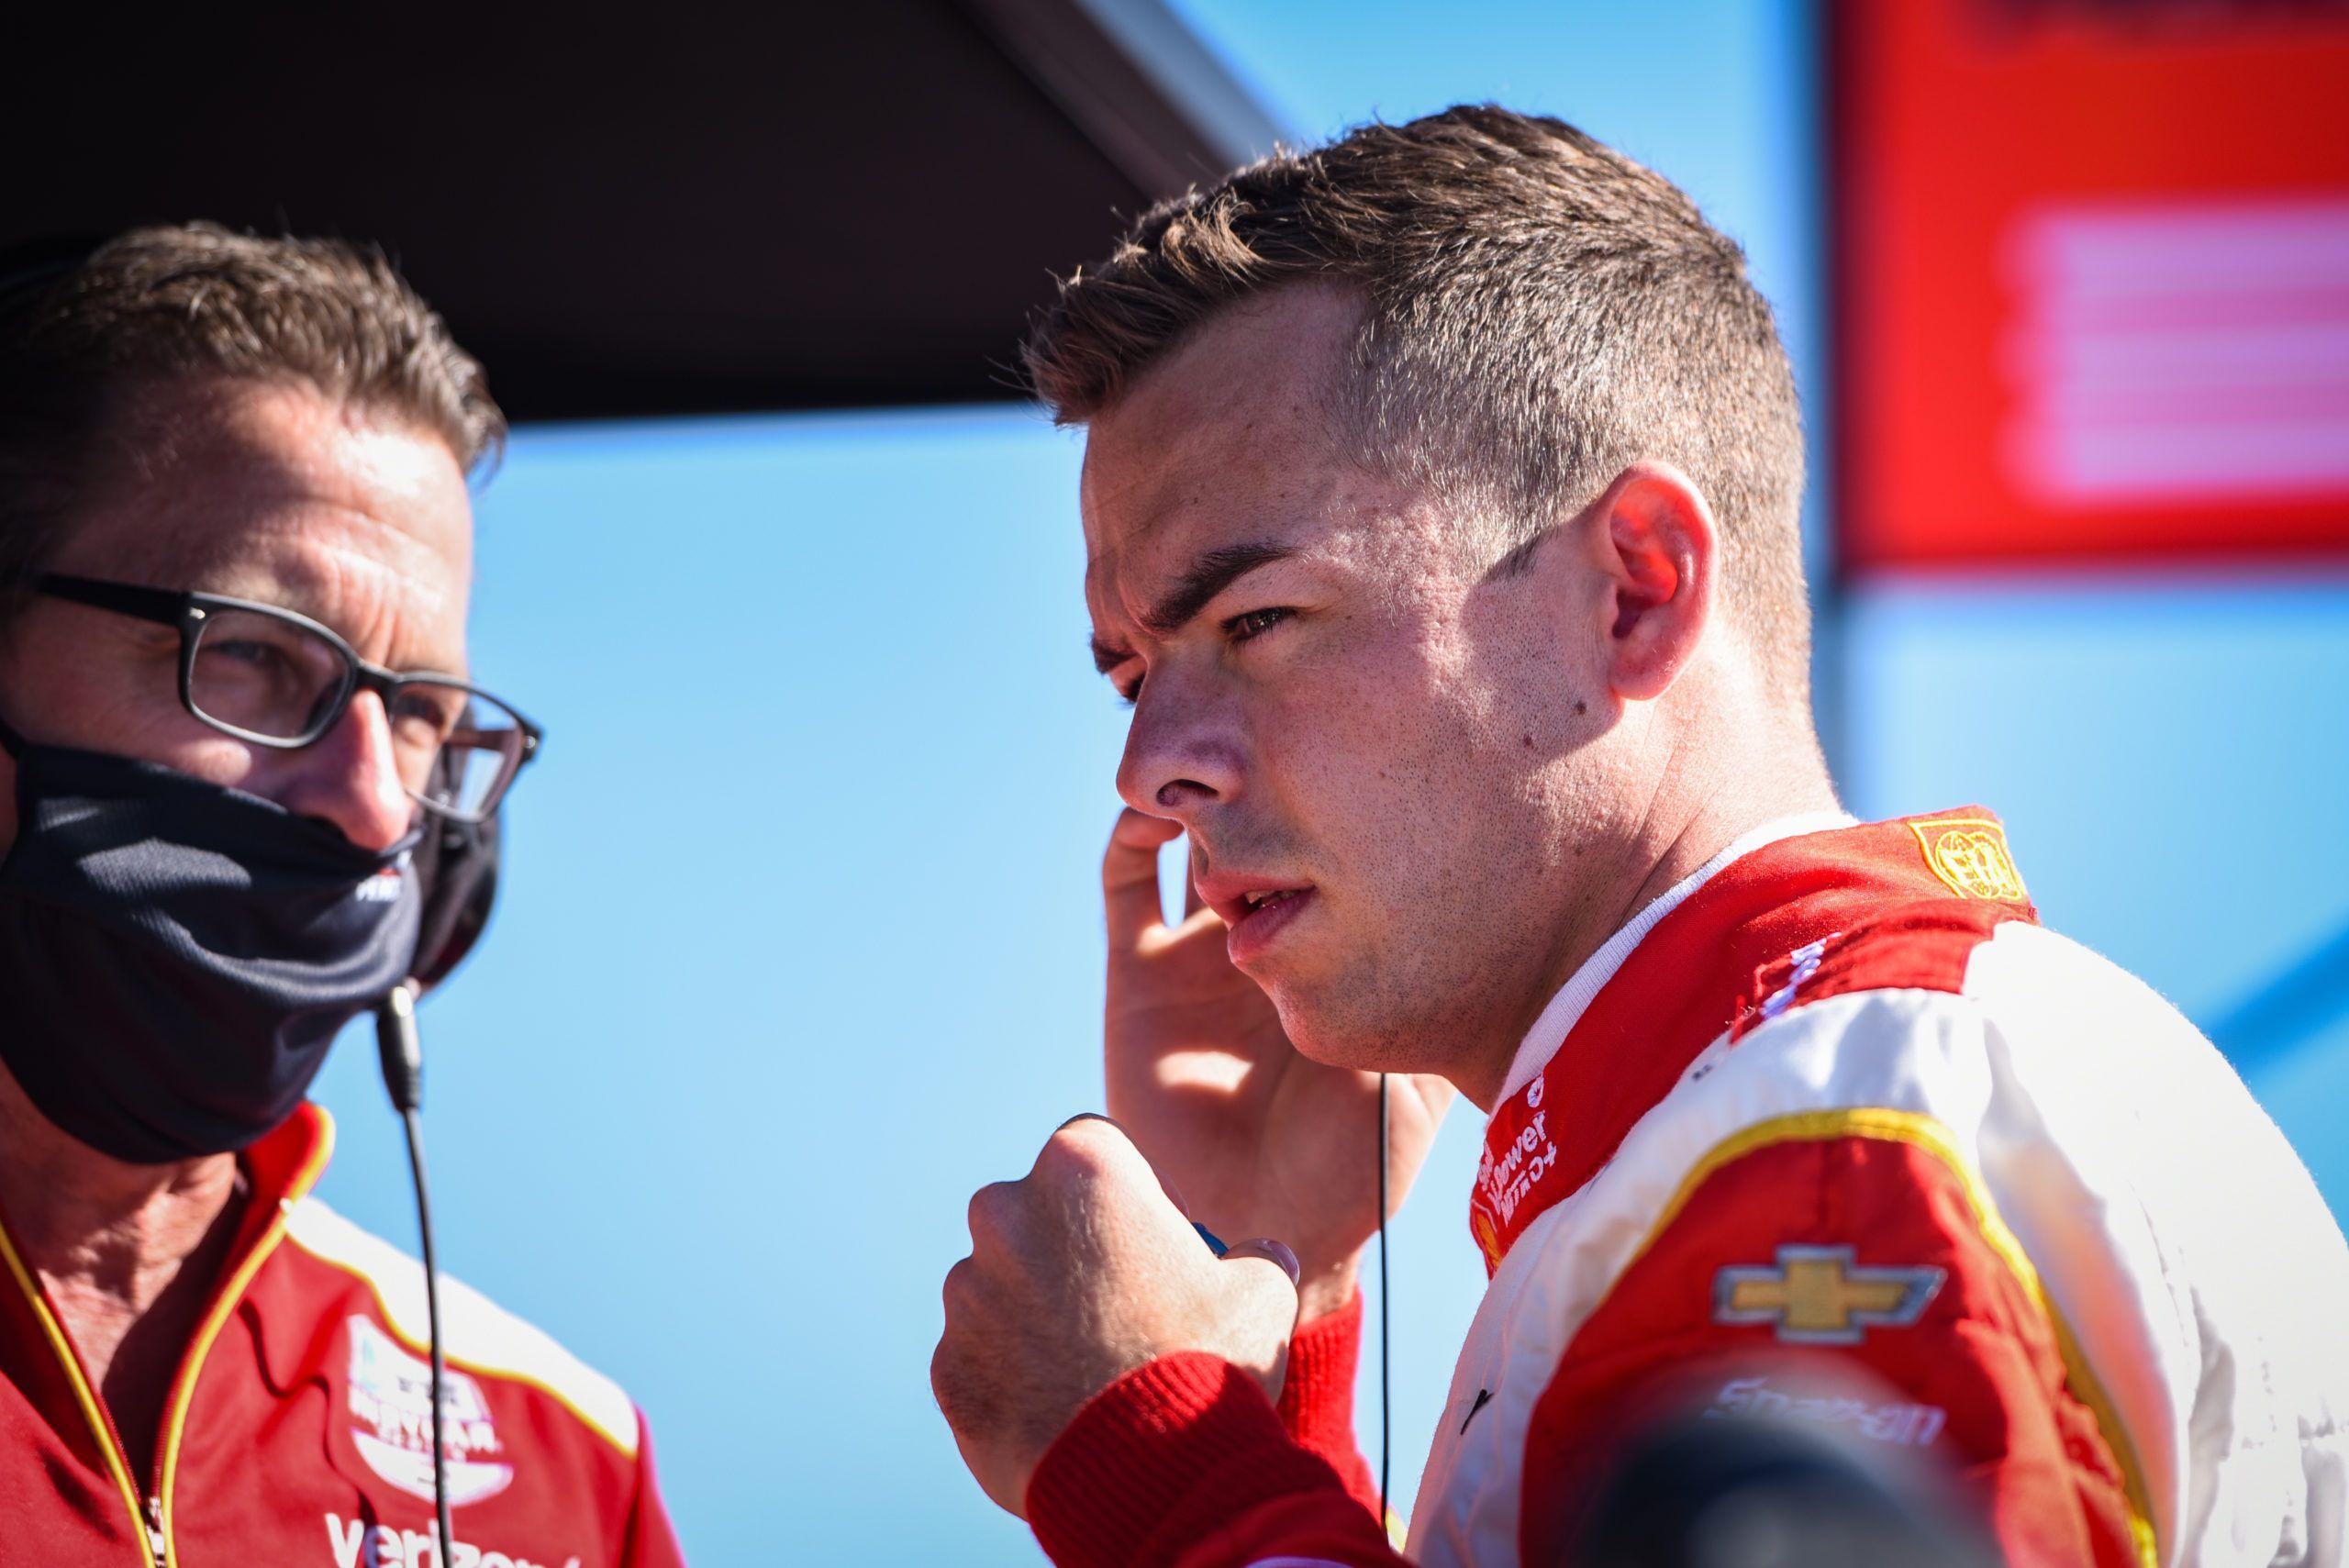 Scott McLaughlin, Team Penske, IndyCar 2021